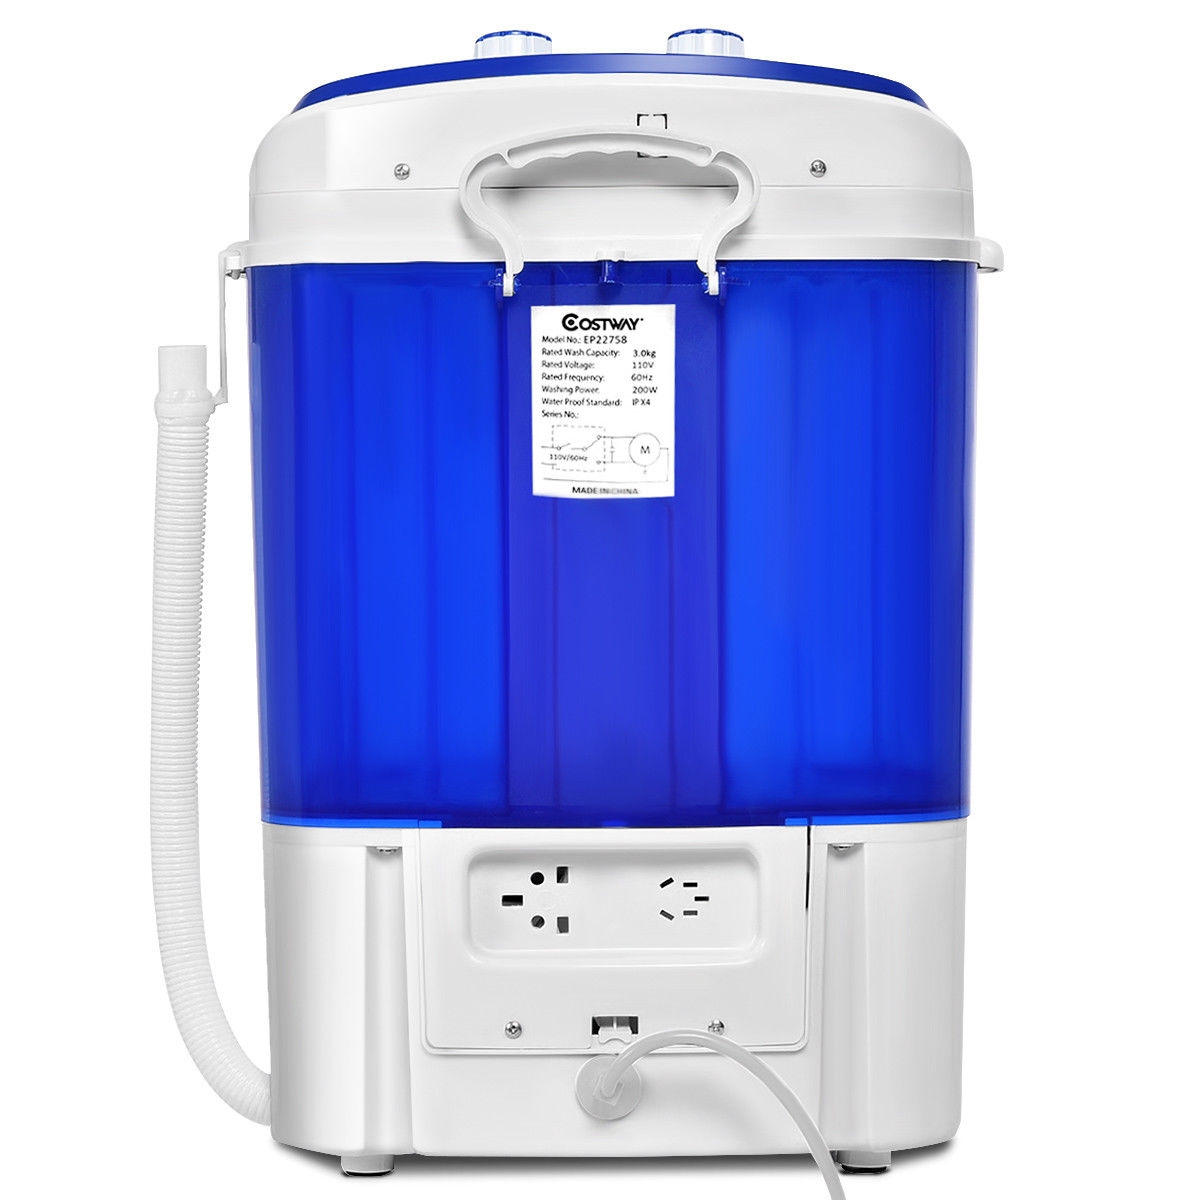 Mini Electric Compact Portable Durable Laundry Washing Machine Washer